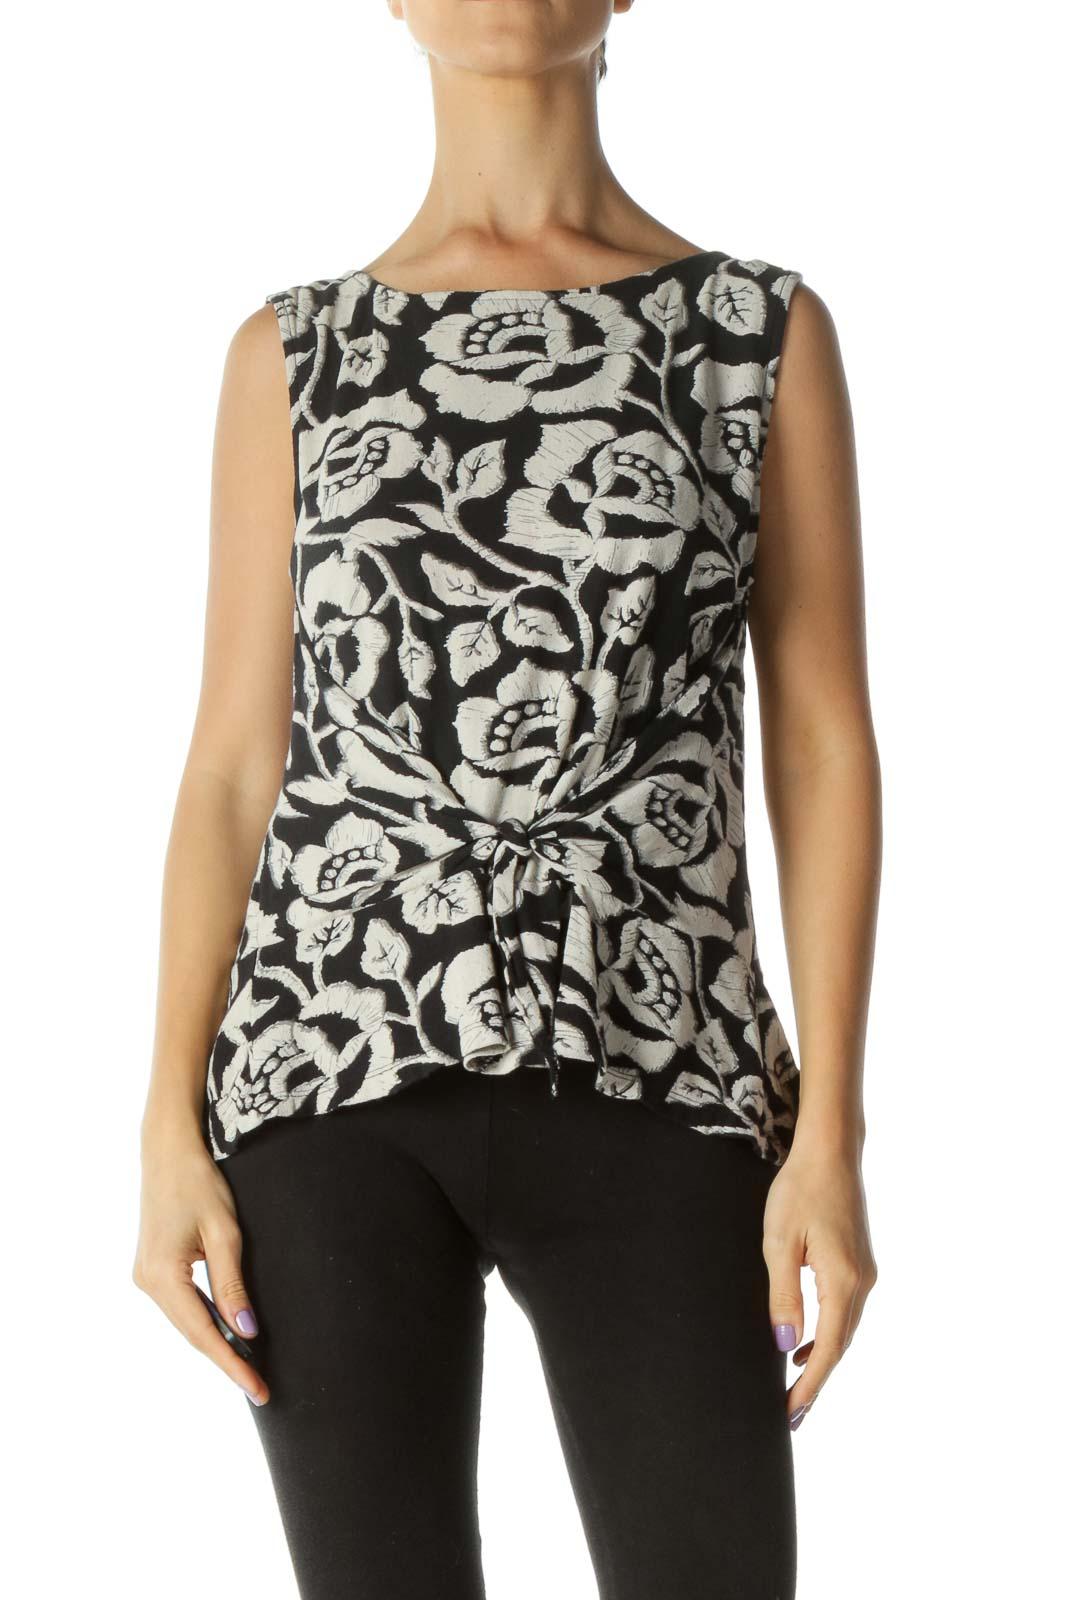 Beige Black Floral Print Knot Detail Tank Top